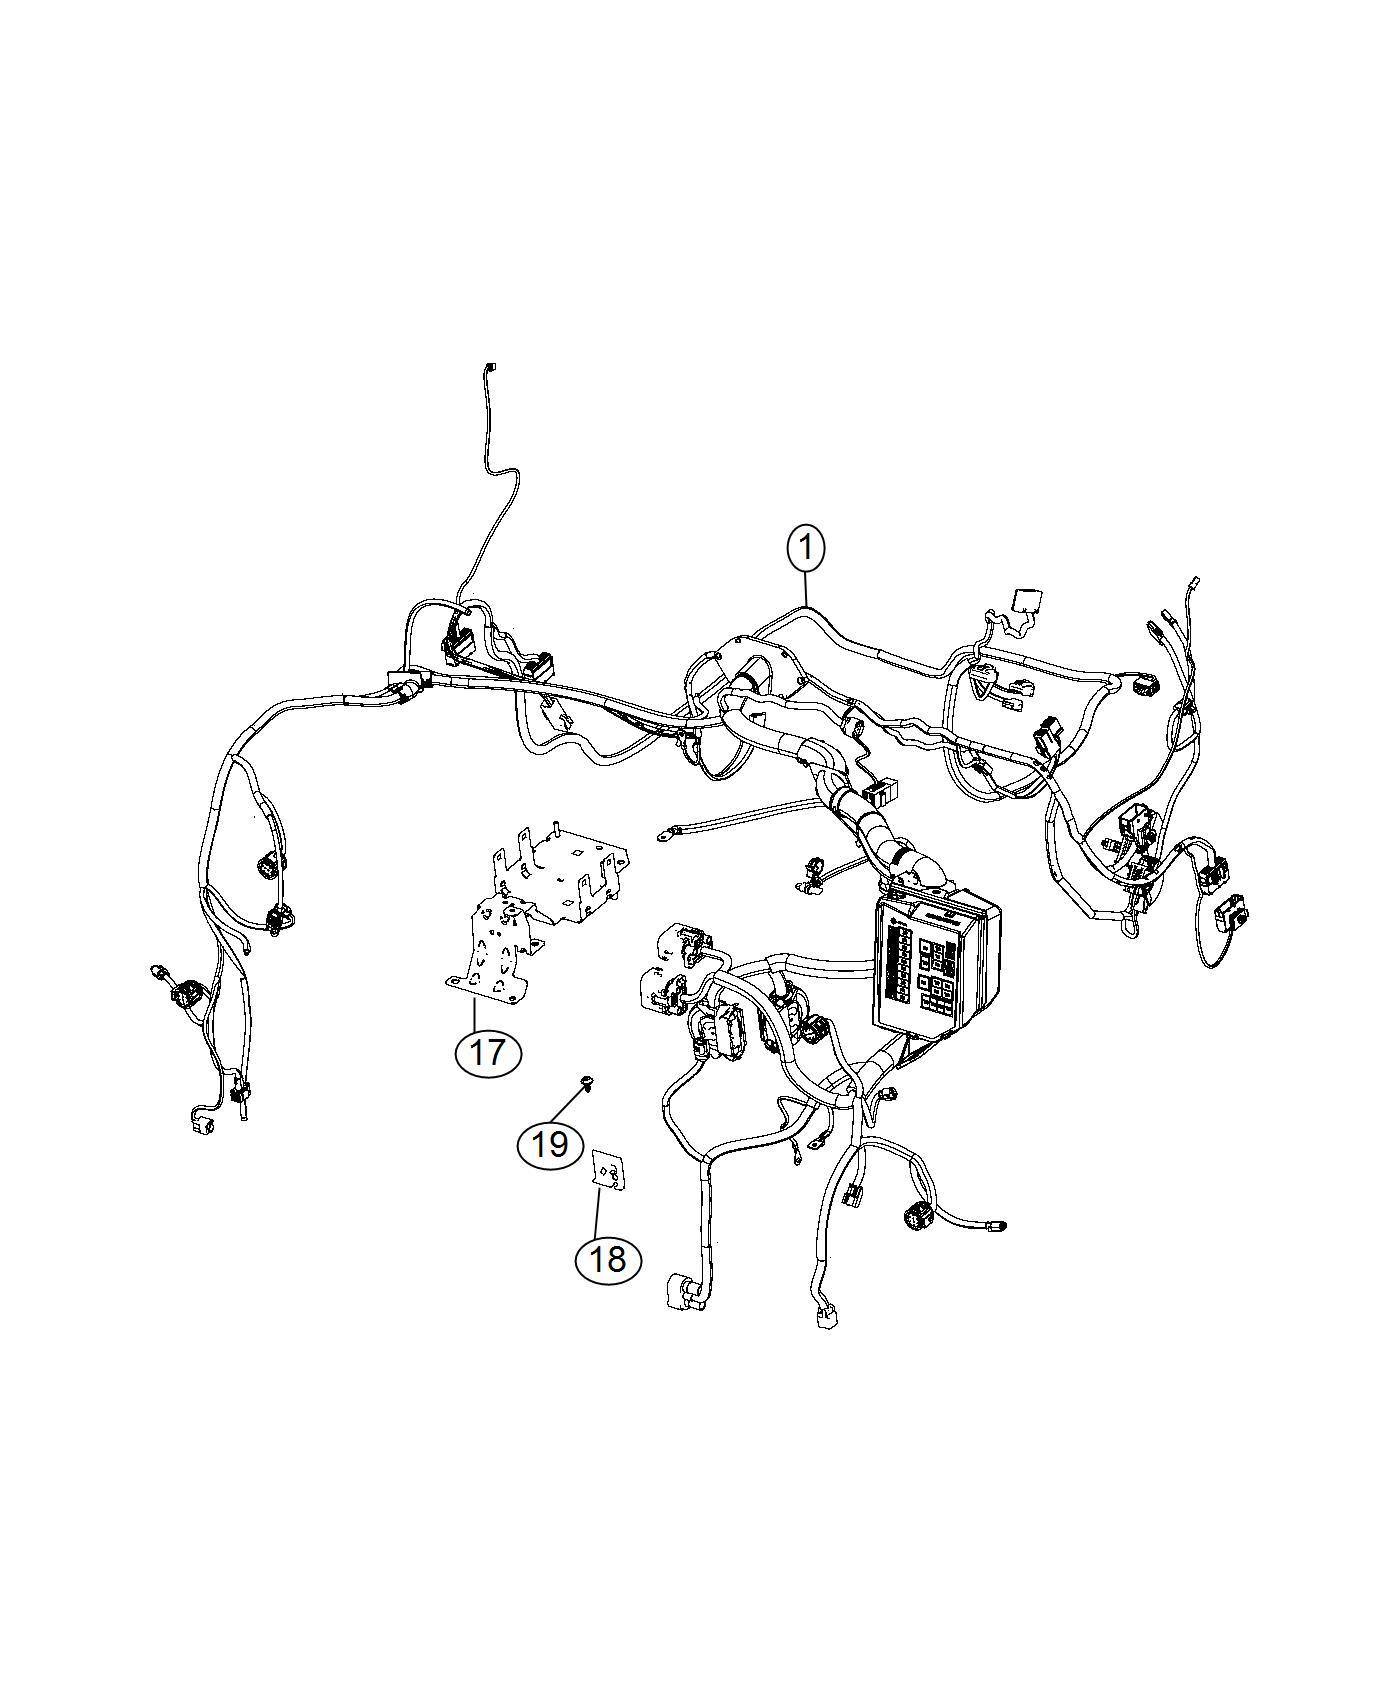 Fiat 500c Wiring  Headlamp To Dash  Speakers  Marked